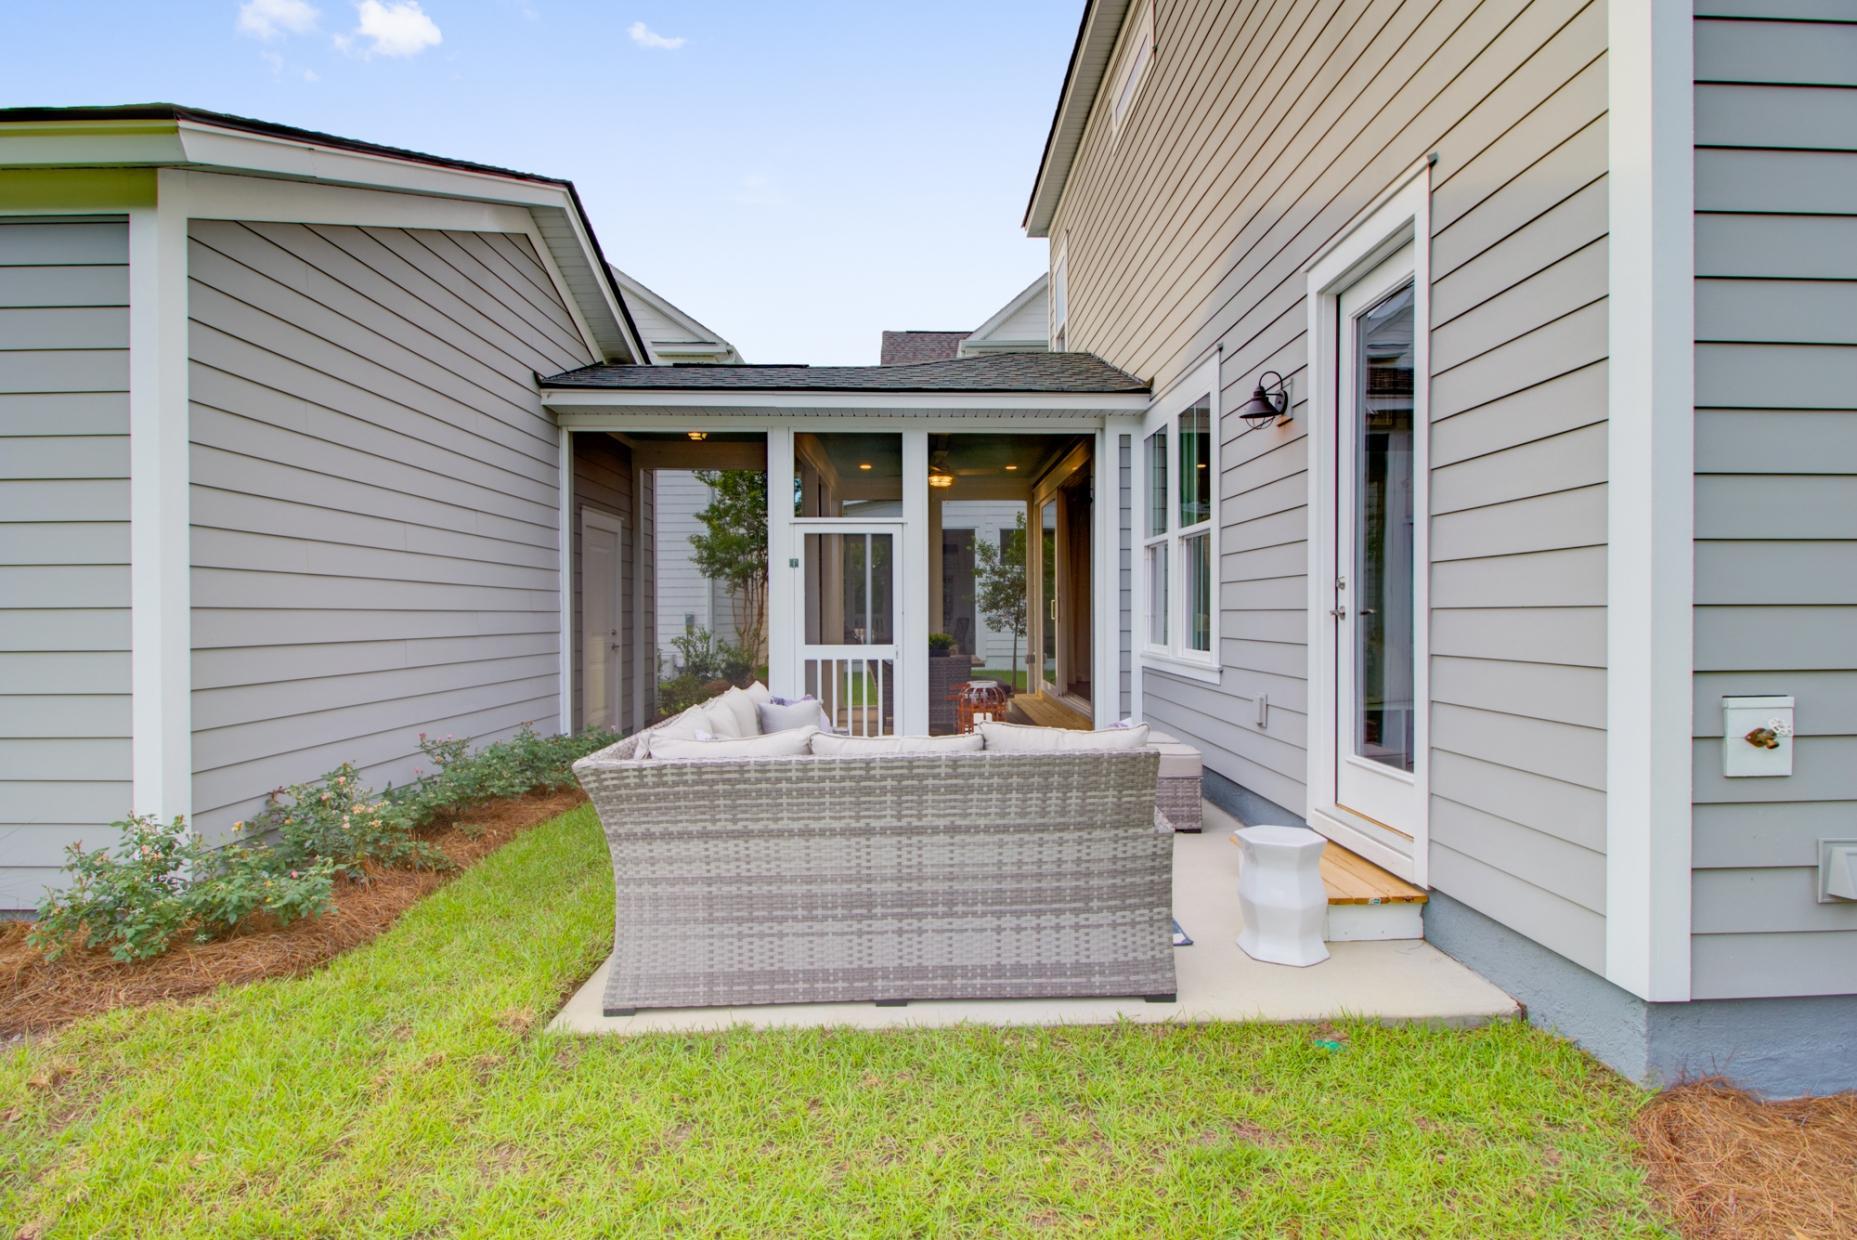 Carnes Crossroads Homes For Sale - 501 Wodin, Summerville, SC - 21